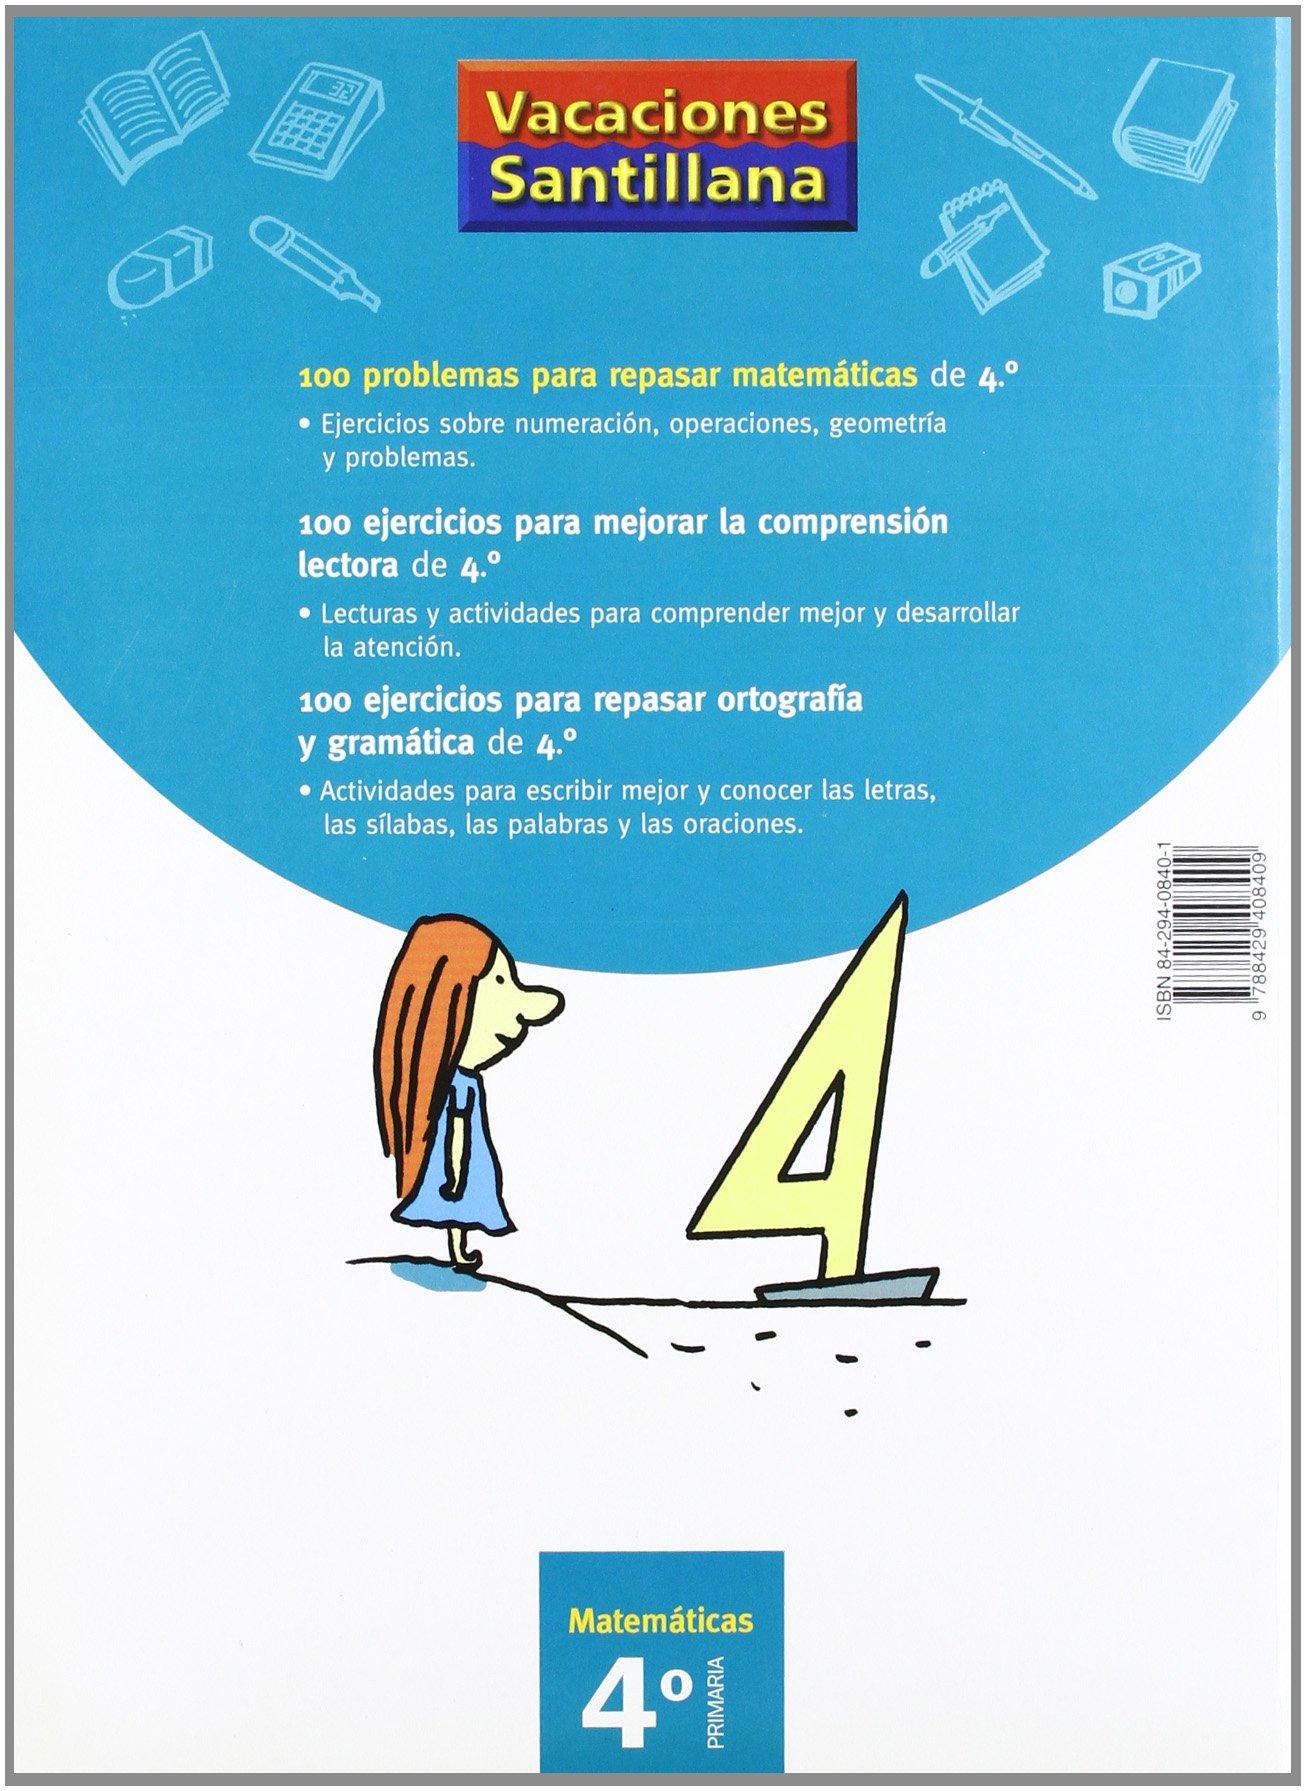 Vacaciónes Santillana 100 Problemas Para Repasar Matemáticas 4 ...